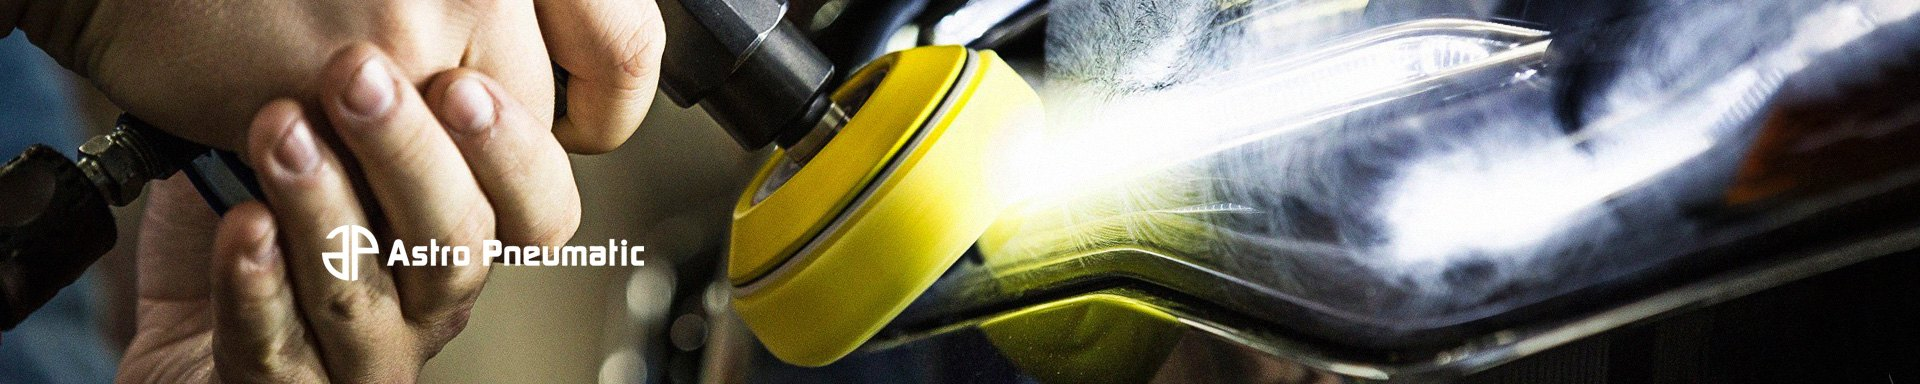 Astro Pneumatic Tool Cooling System Repair Tools